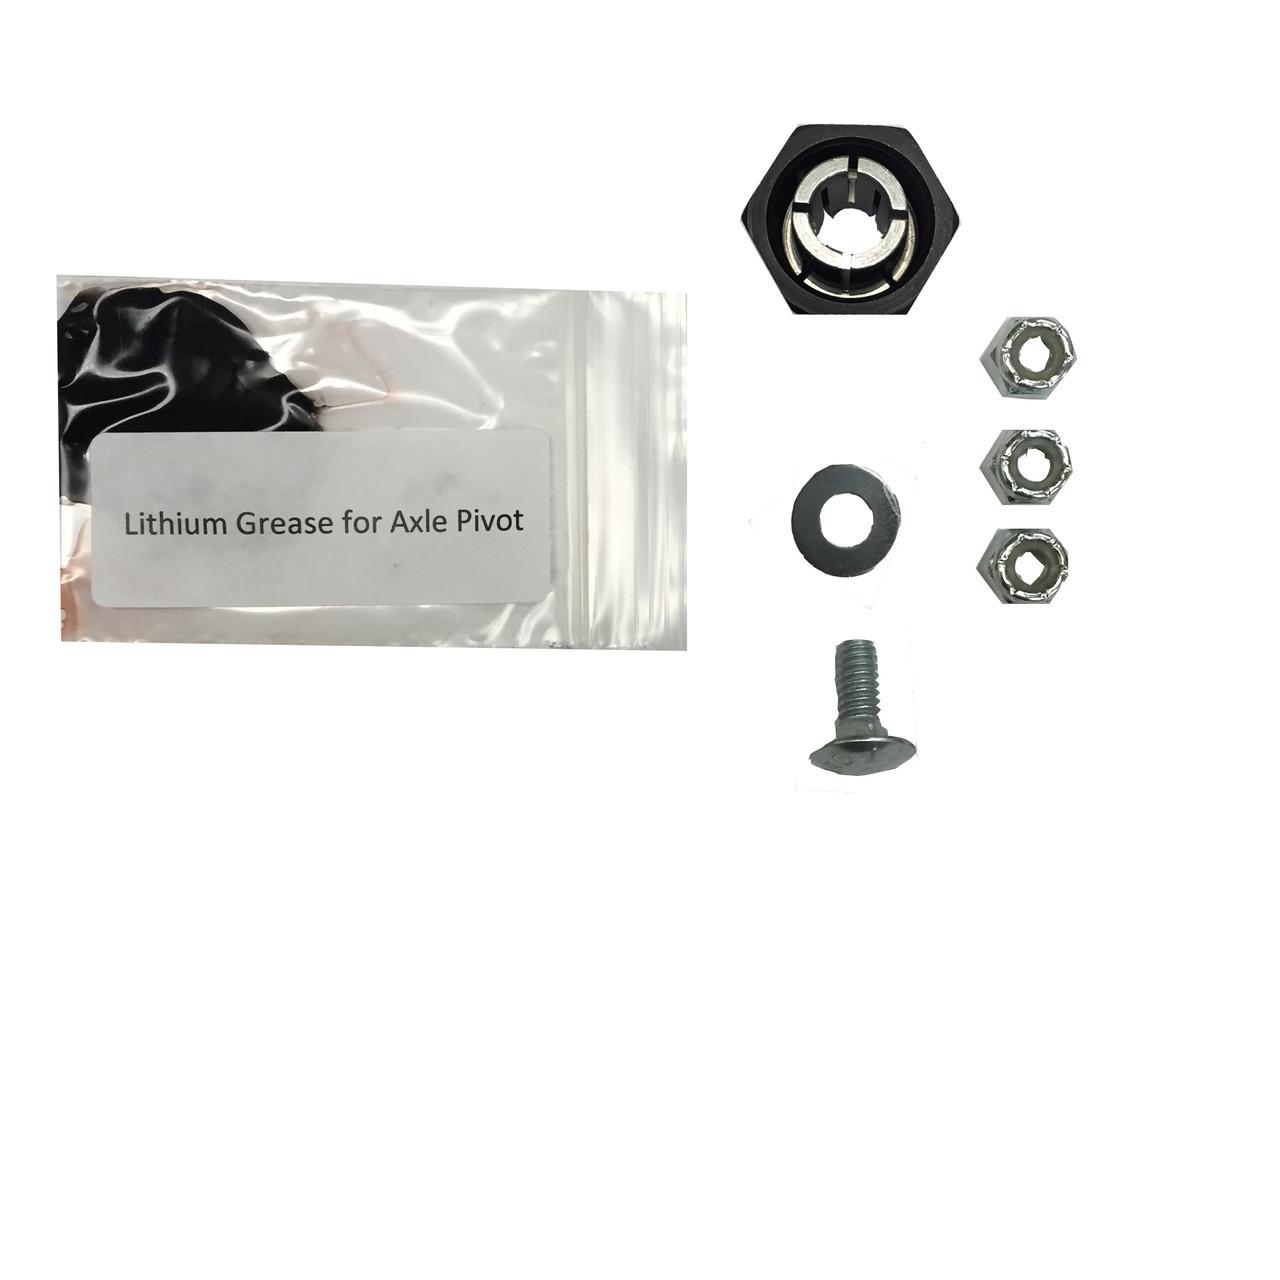 K21124 - Bosch Motor Carriage Upgrade For TSM-21 Pocket Cutter [Motor NOT Included]